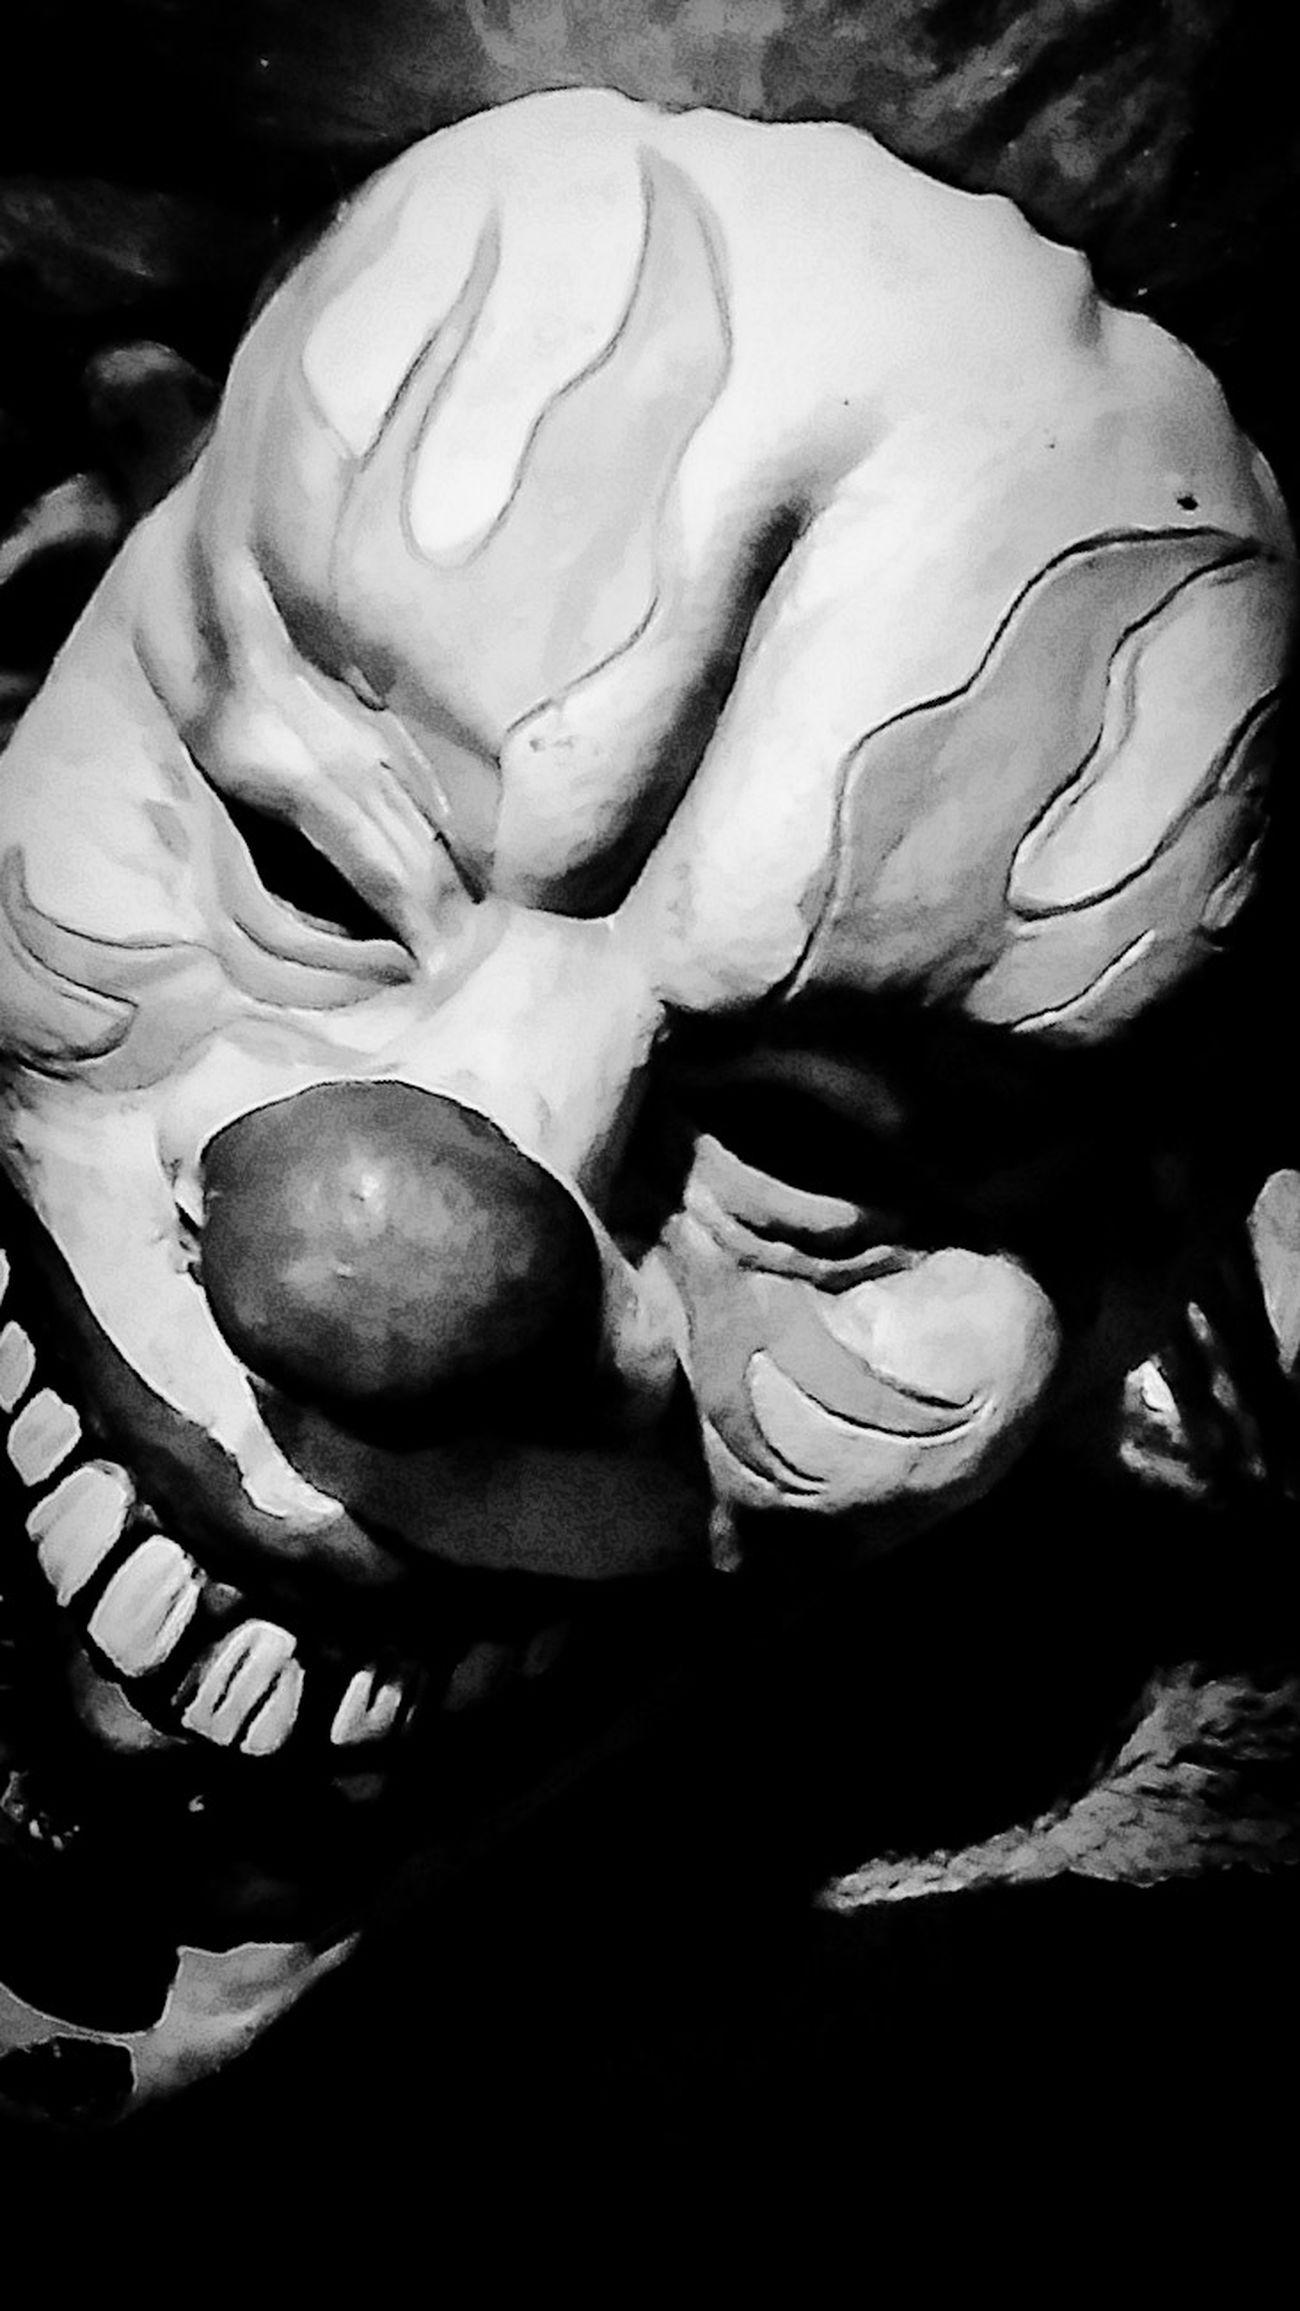 Blackandwhite Black & White Clown Wicked Juggalo Pride FuckYou Happy :) Sickness Photoshop Cheese! Homies